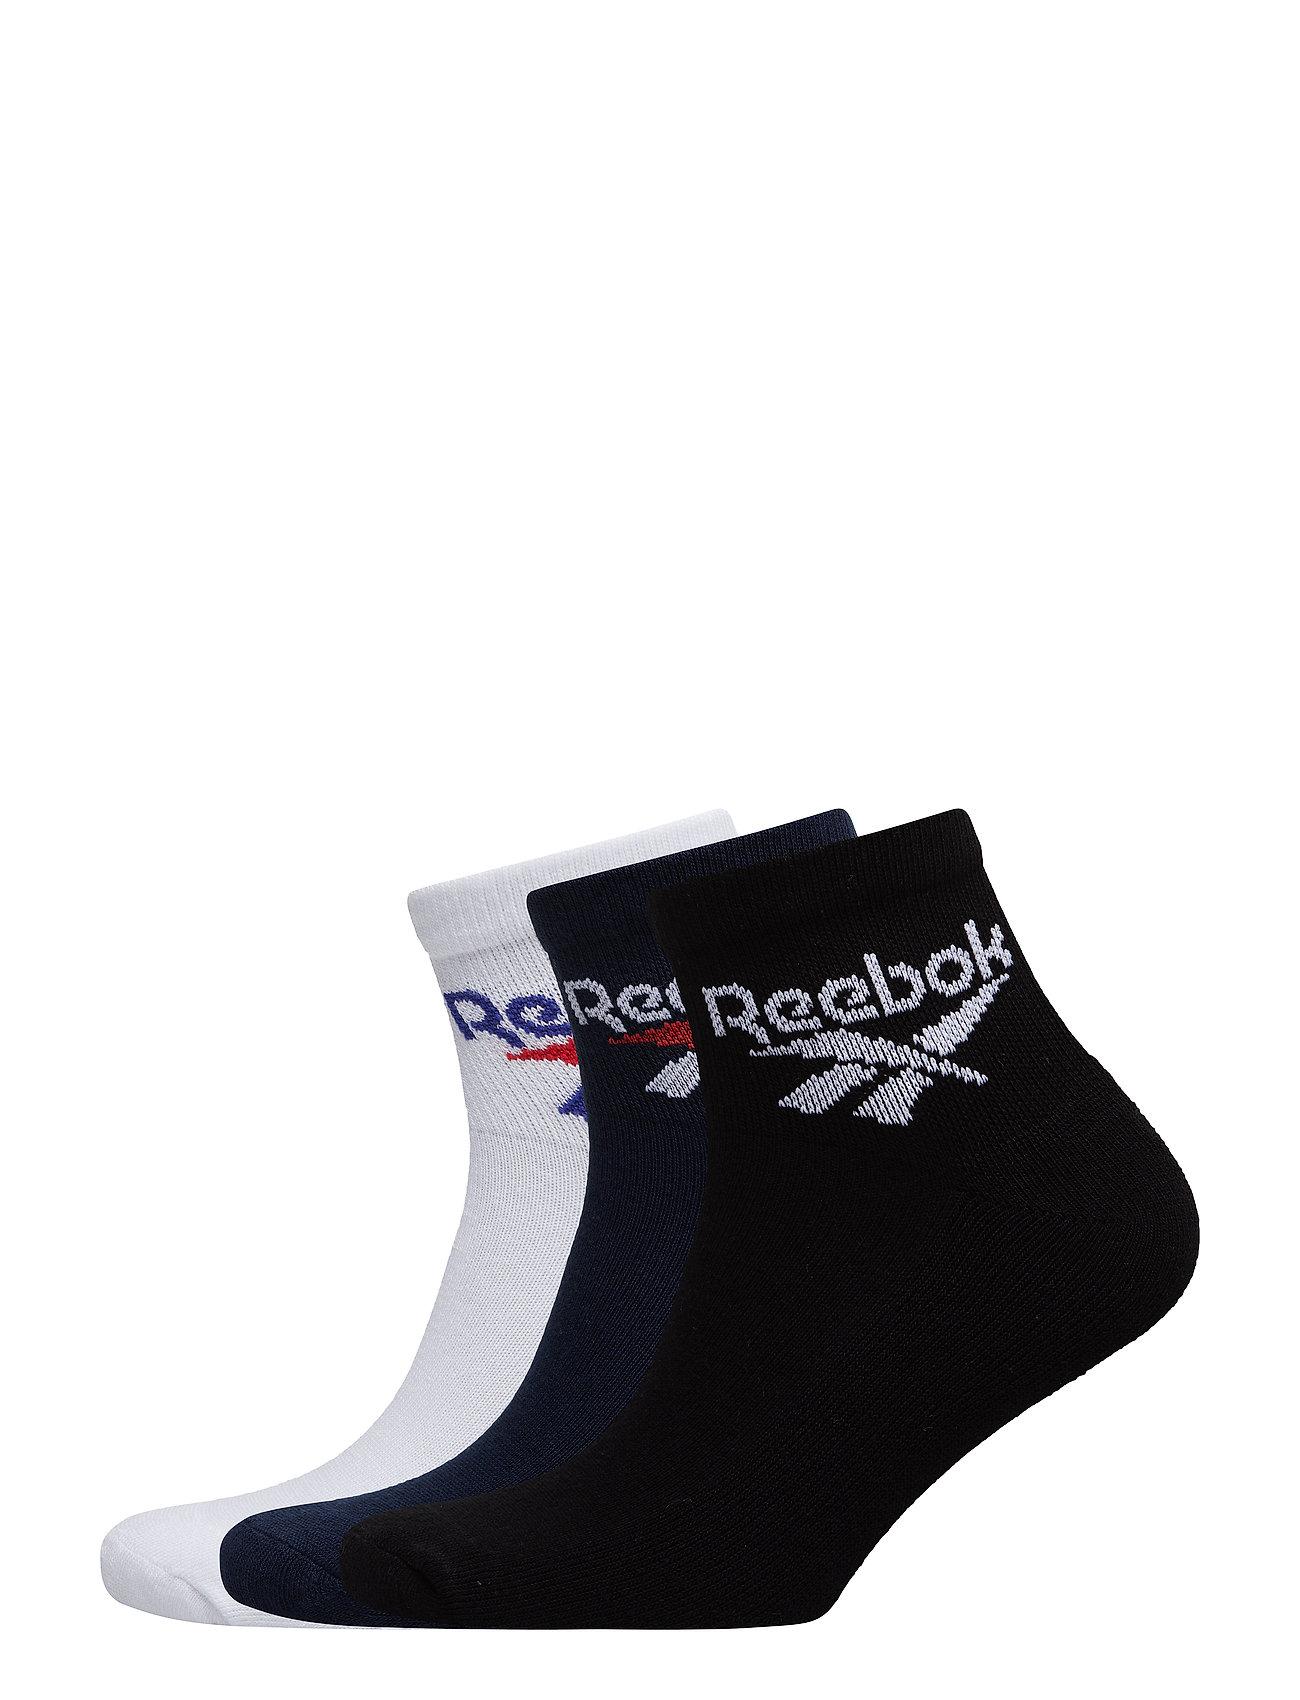 9f9a9647b91 Cl Lost   Found Sock (Black conavy white) (111.75 kr) - Reebok ...